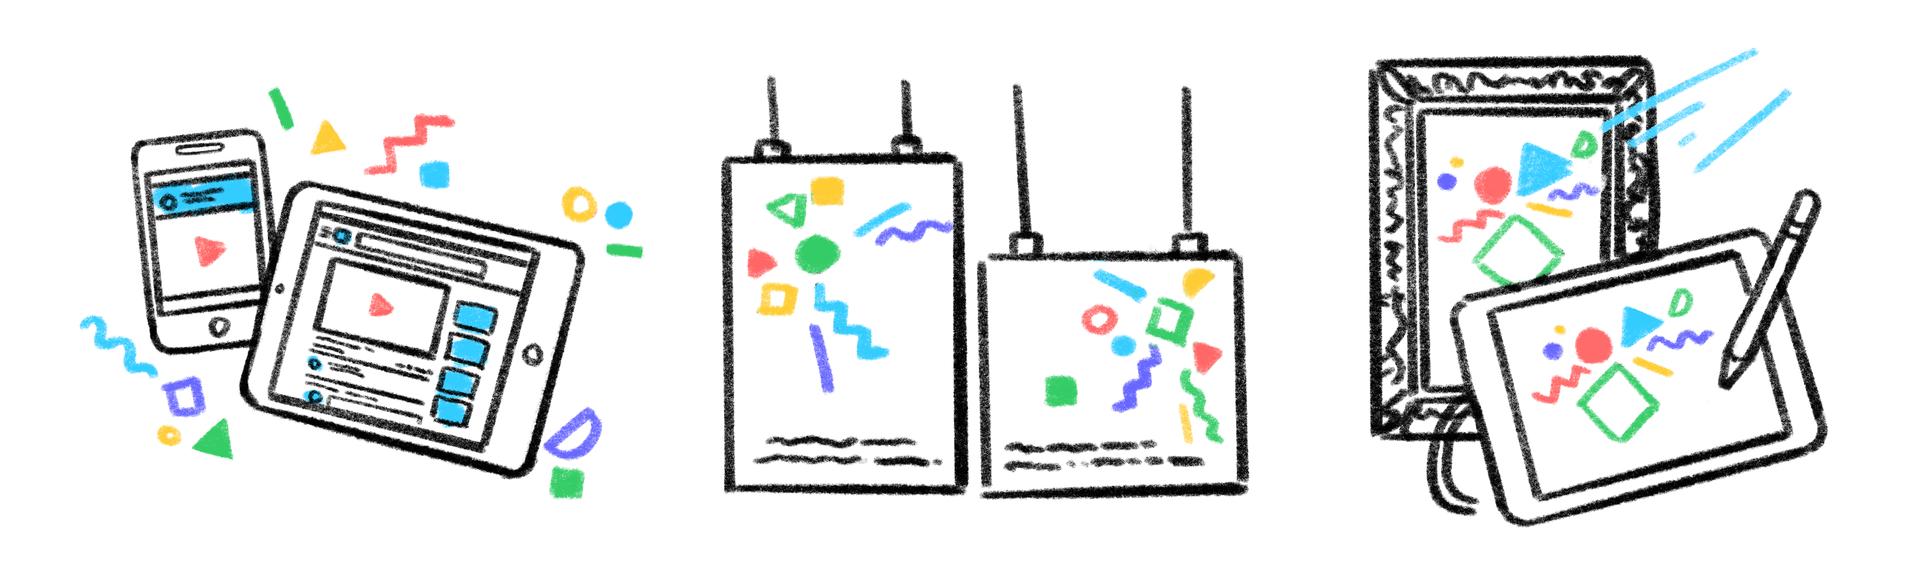 cms illustrations copy.png